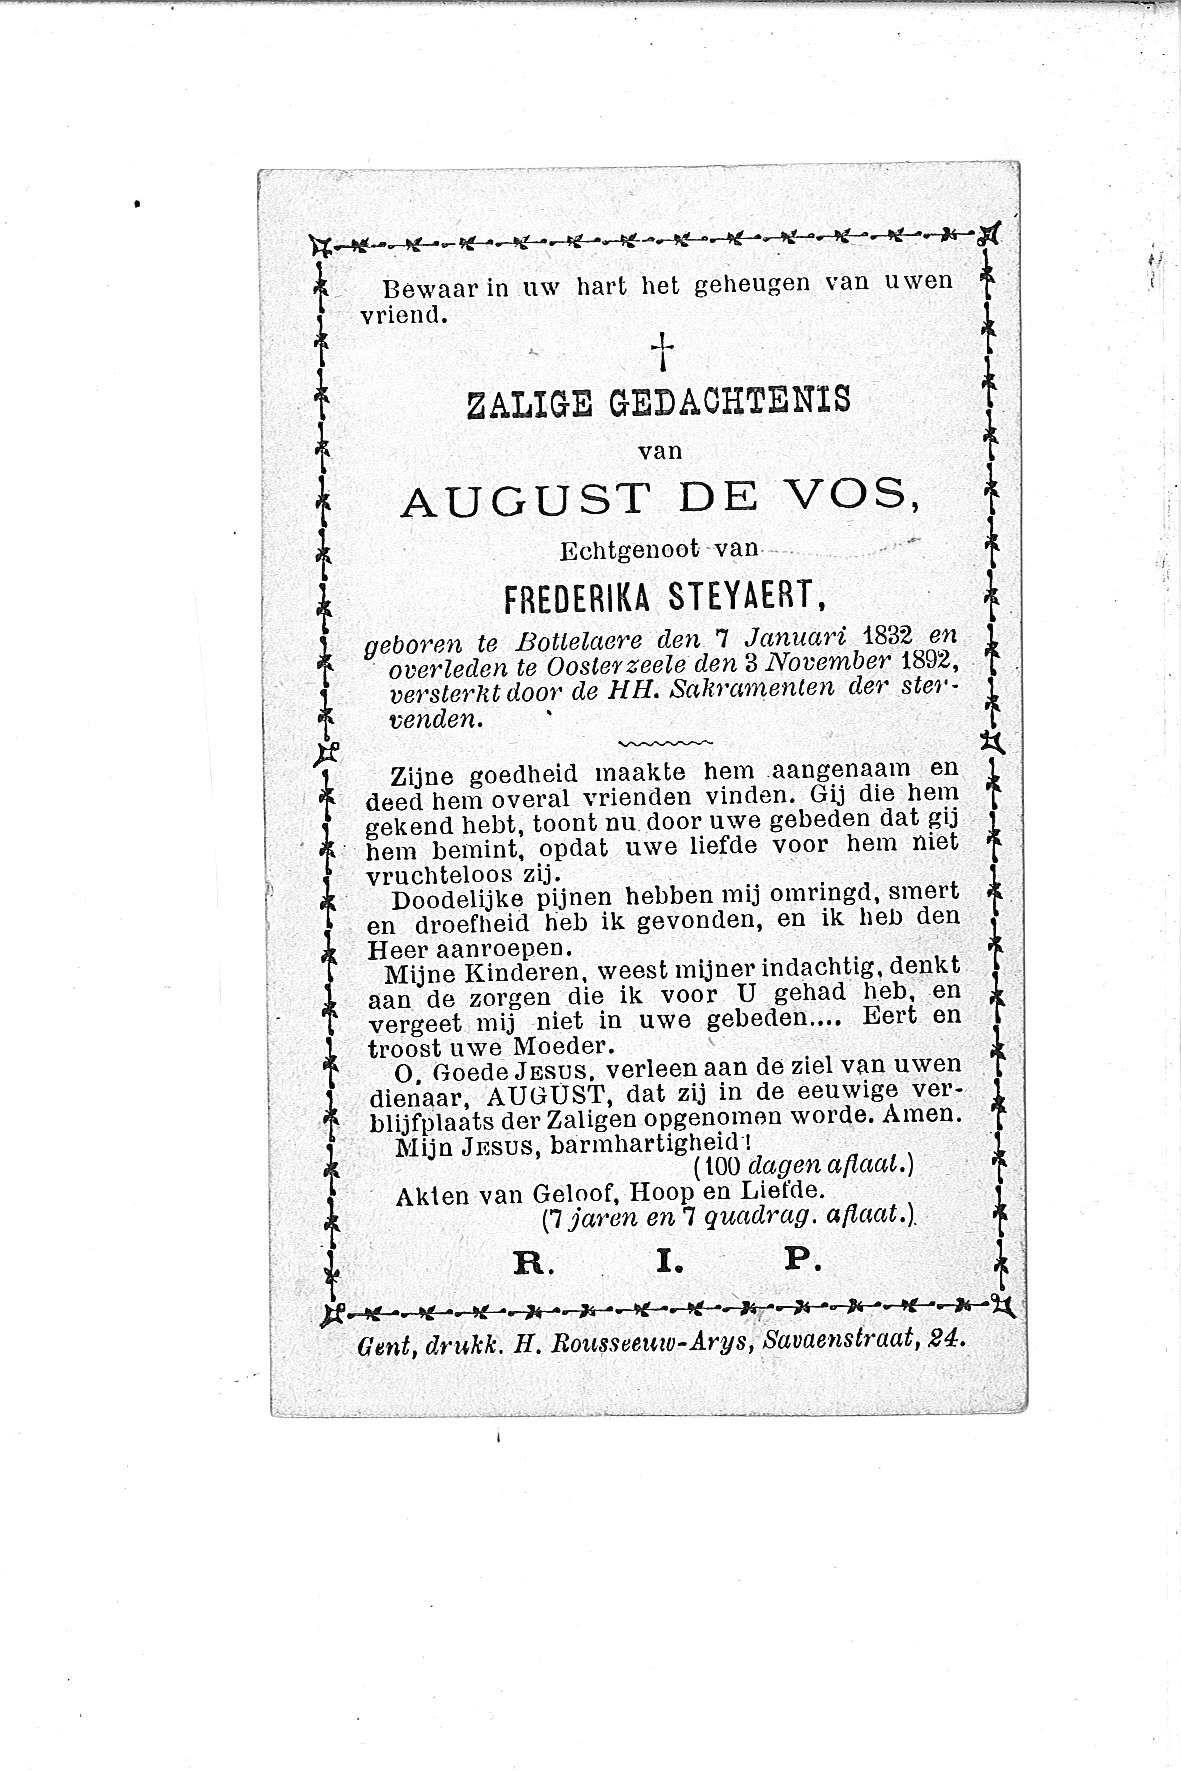 August (1892) 20120229111258_00005.jpg